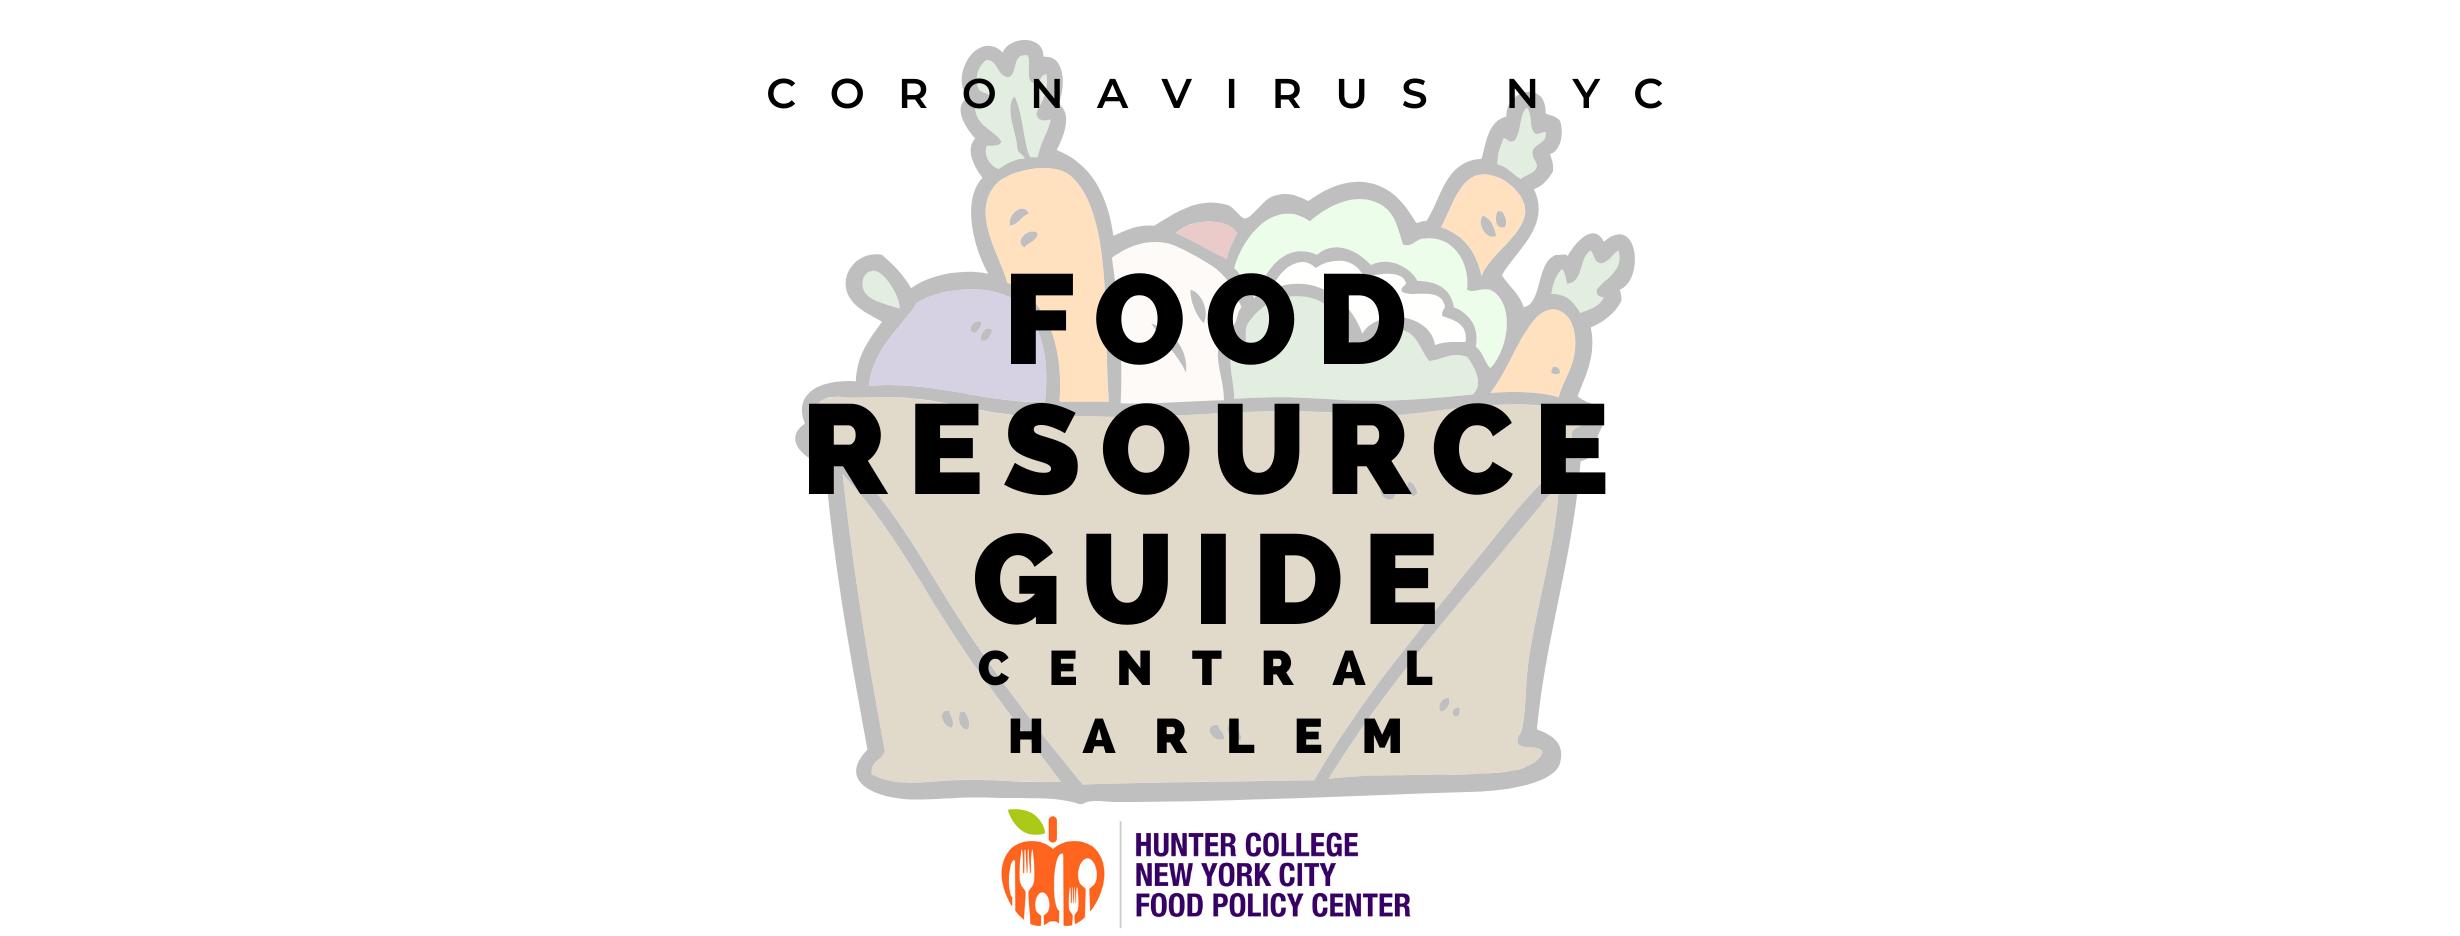 Coronavirus Nyc Food Resource Guide Central Harlem Nyc Food Policy Centernyc Food Policy Center